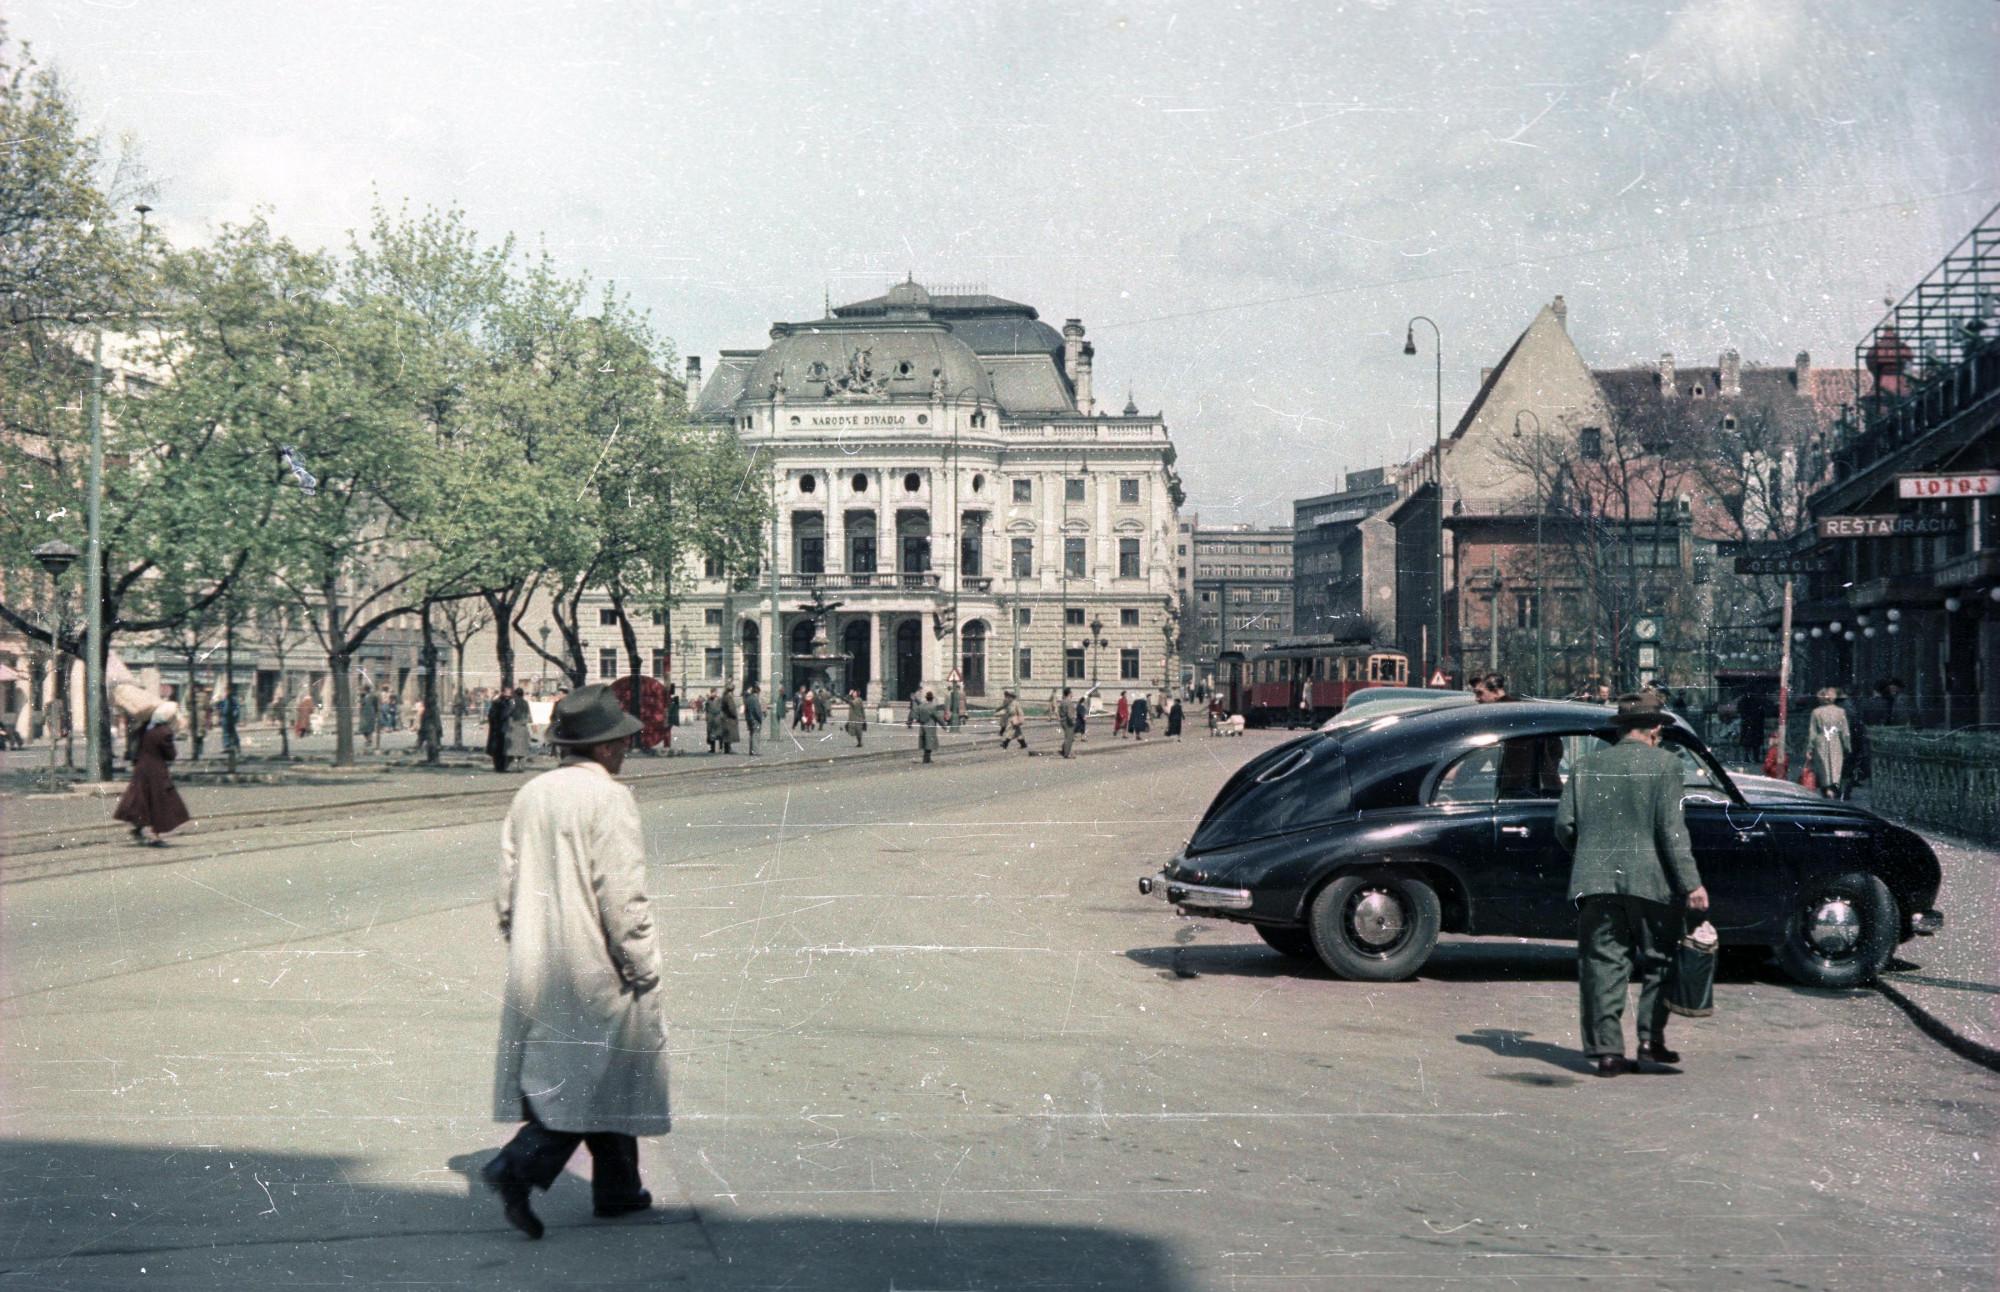 1959 Bratislava Братислава. Площадь Гвездослава напротив Национального театра2